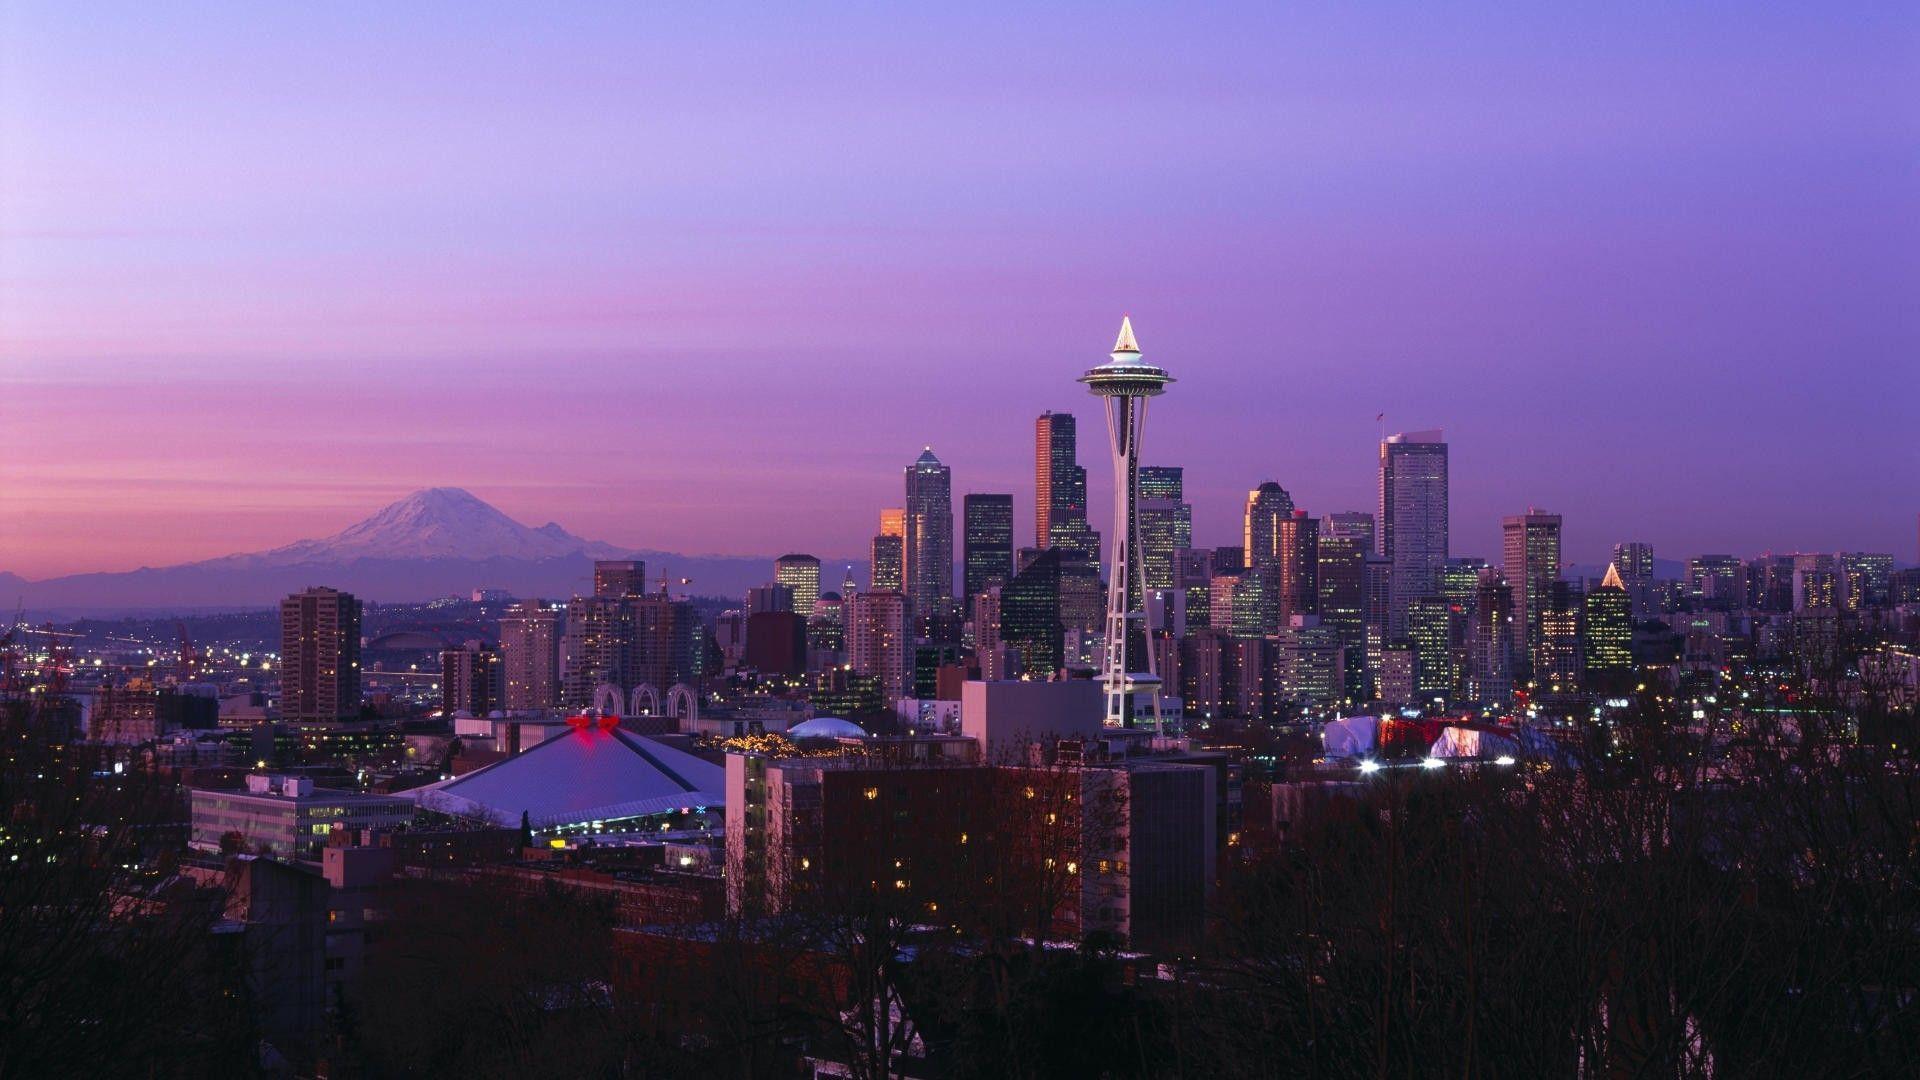 Seattle Skyline Wallpapers Top Free Seattle Skyline Backgrounds Wallpaperaccess